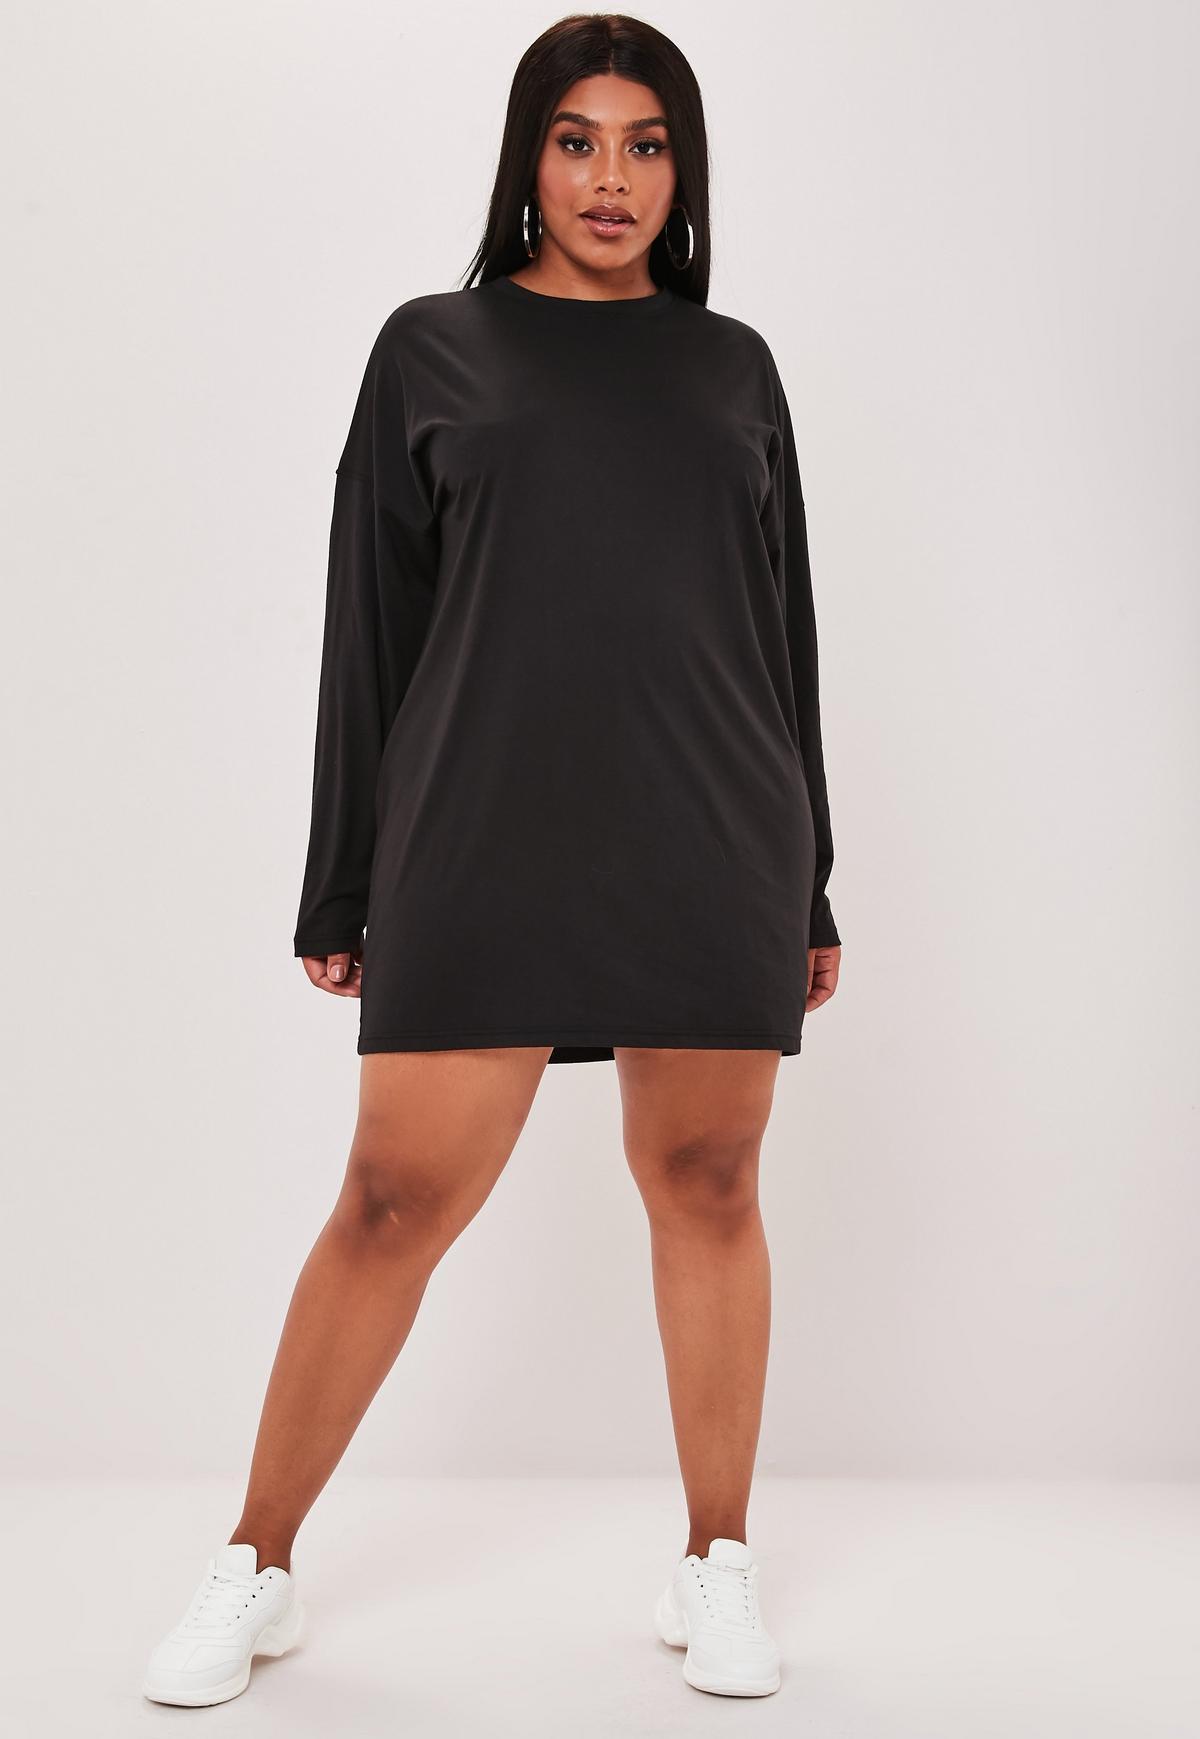 Plus Size Black Hawaii Graphic Long Sleeve T Shirt Dress